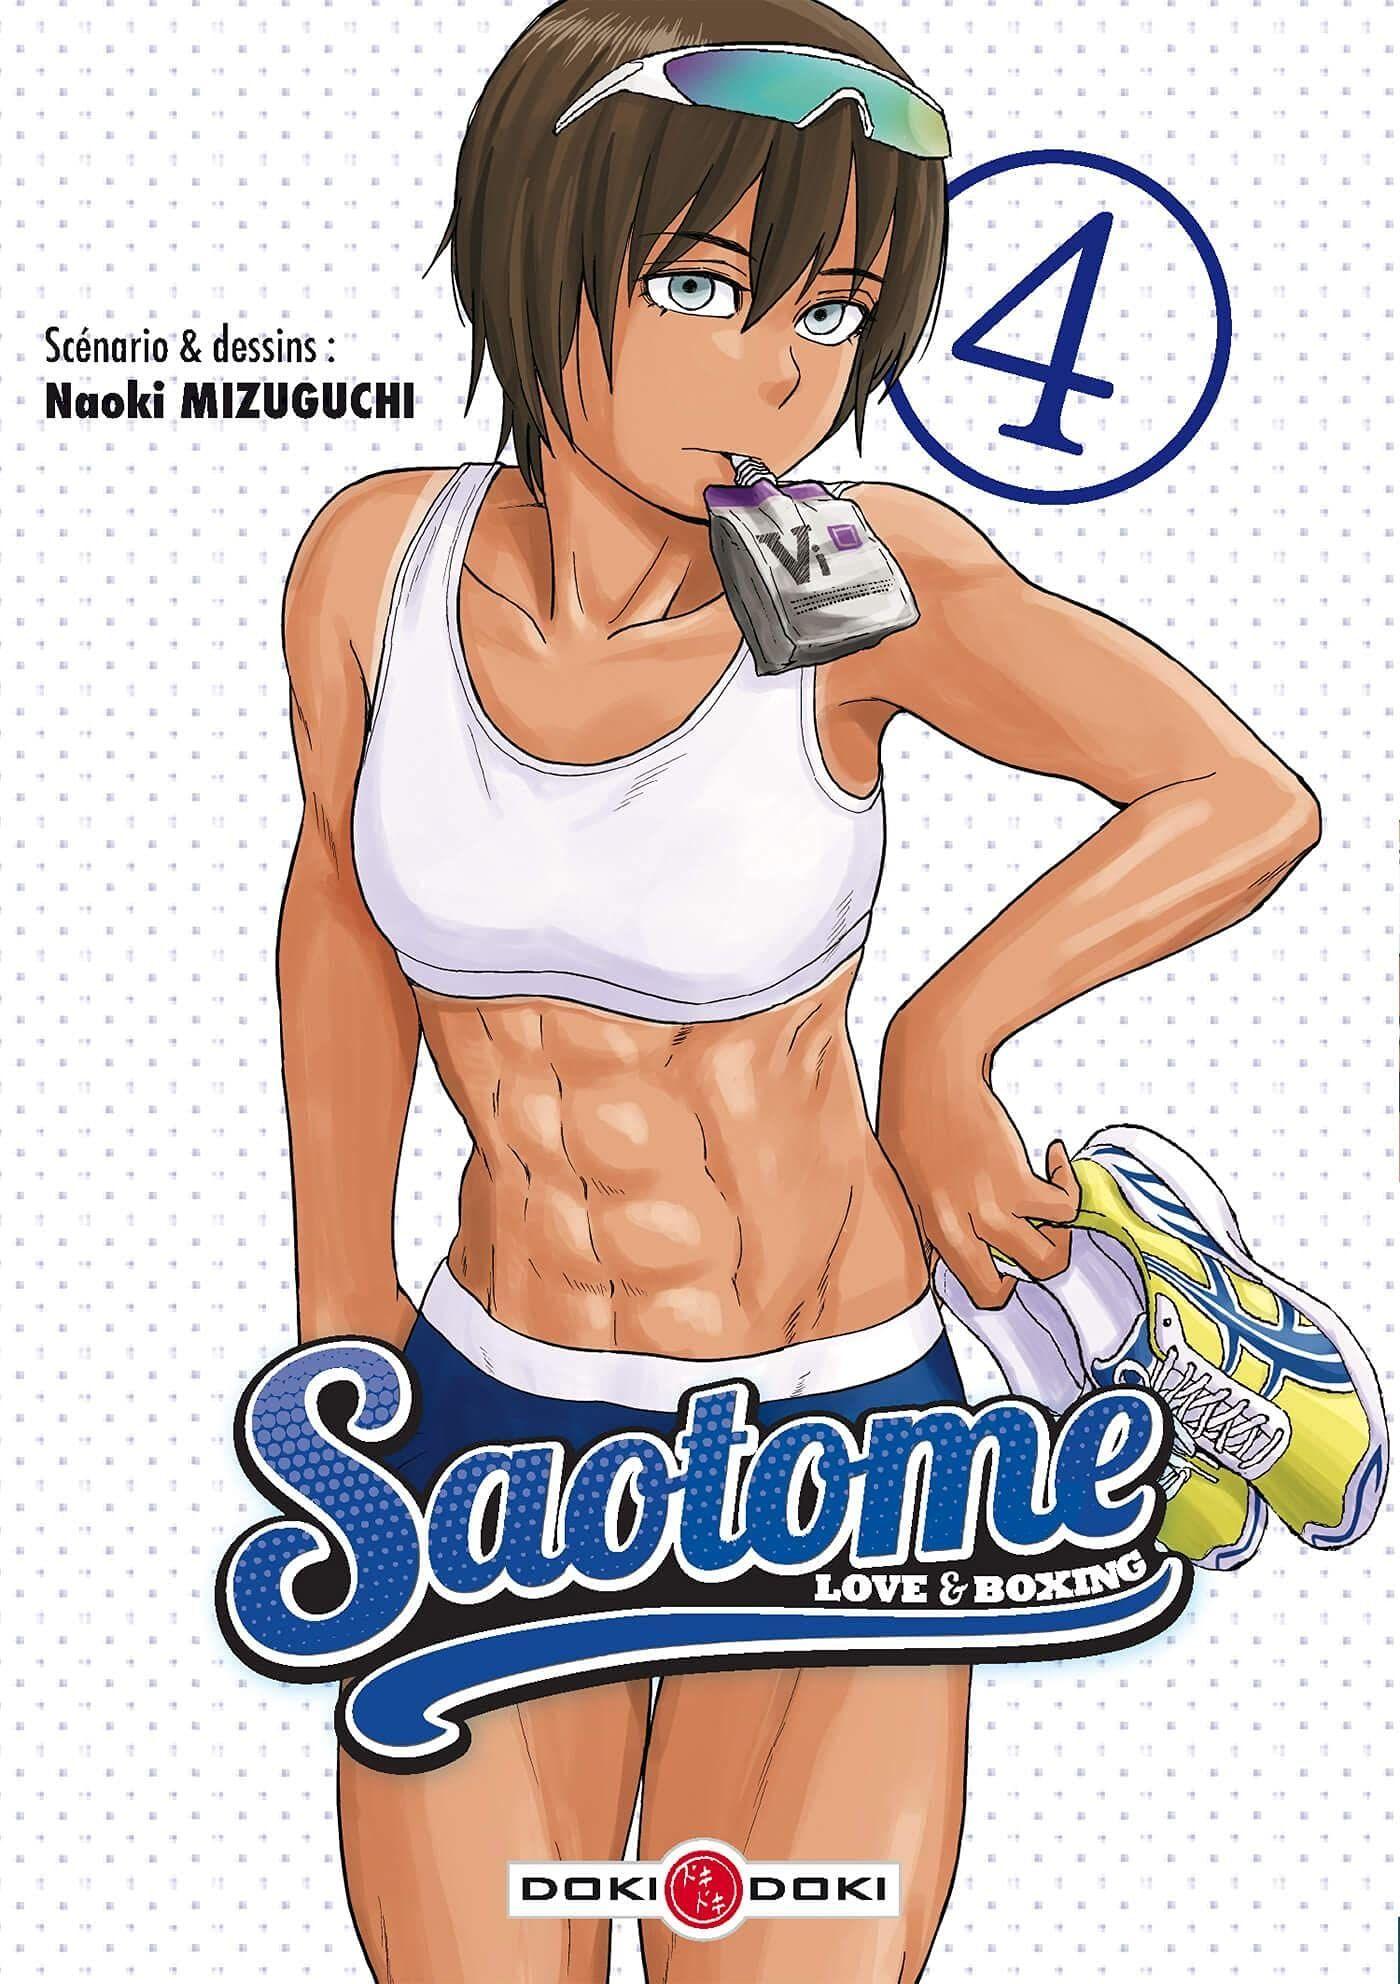 Saotome - Love & Boxing Vol.4